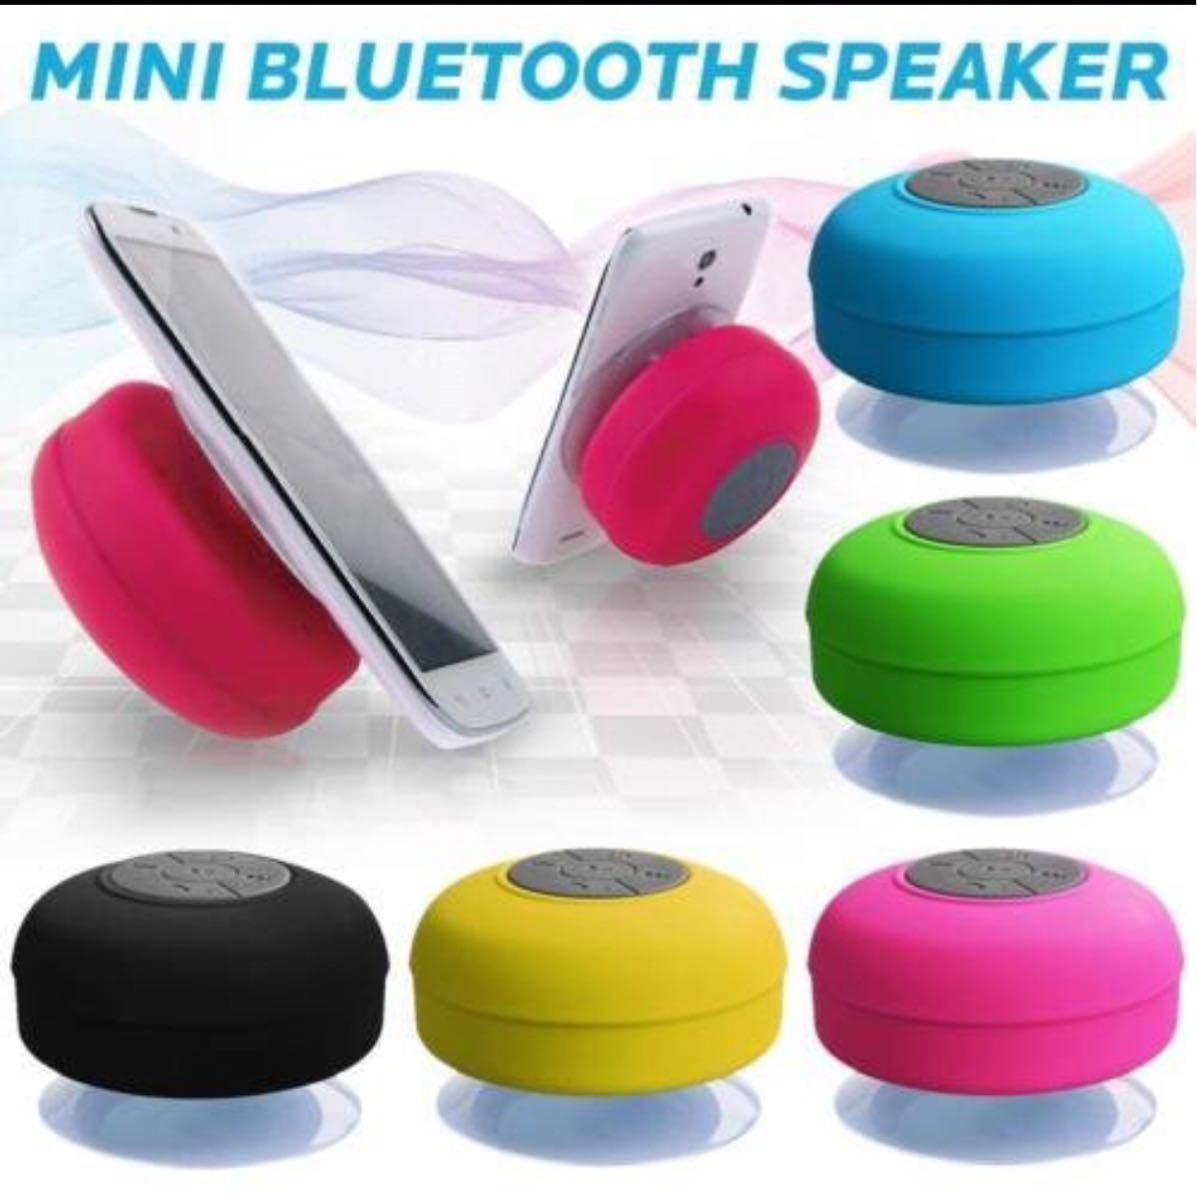 Waterproof Wireless Bluetooth Speaker Shower Handsfree Built-in MIC Player 防水ブルートゥーススピーカー 緑_画像2